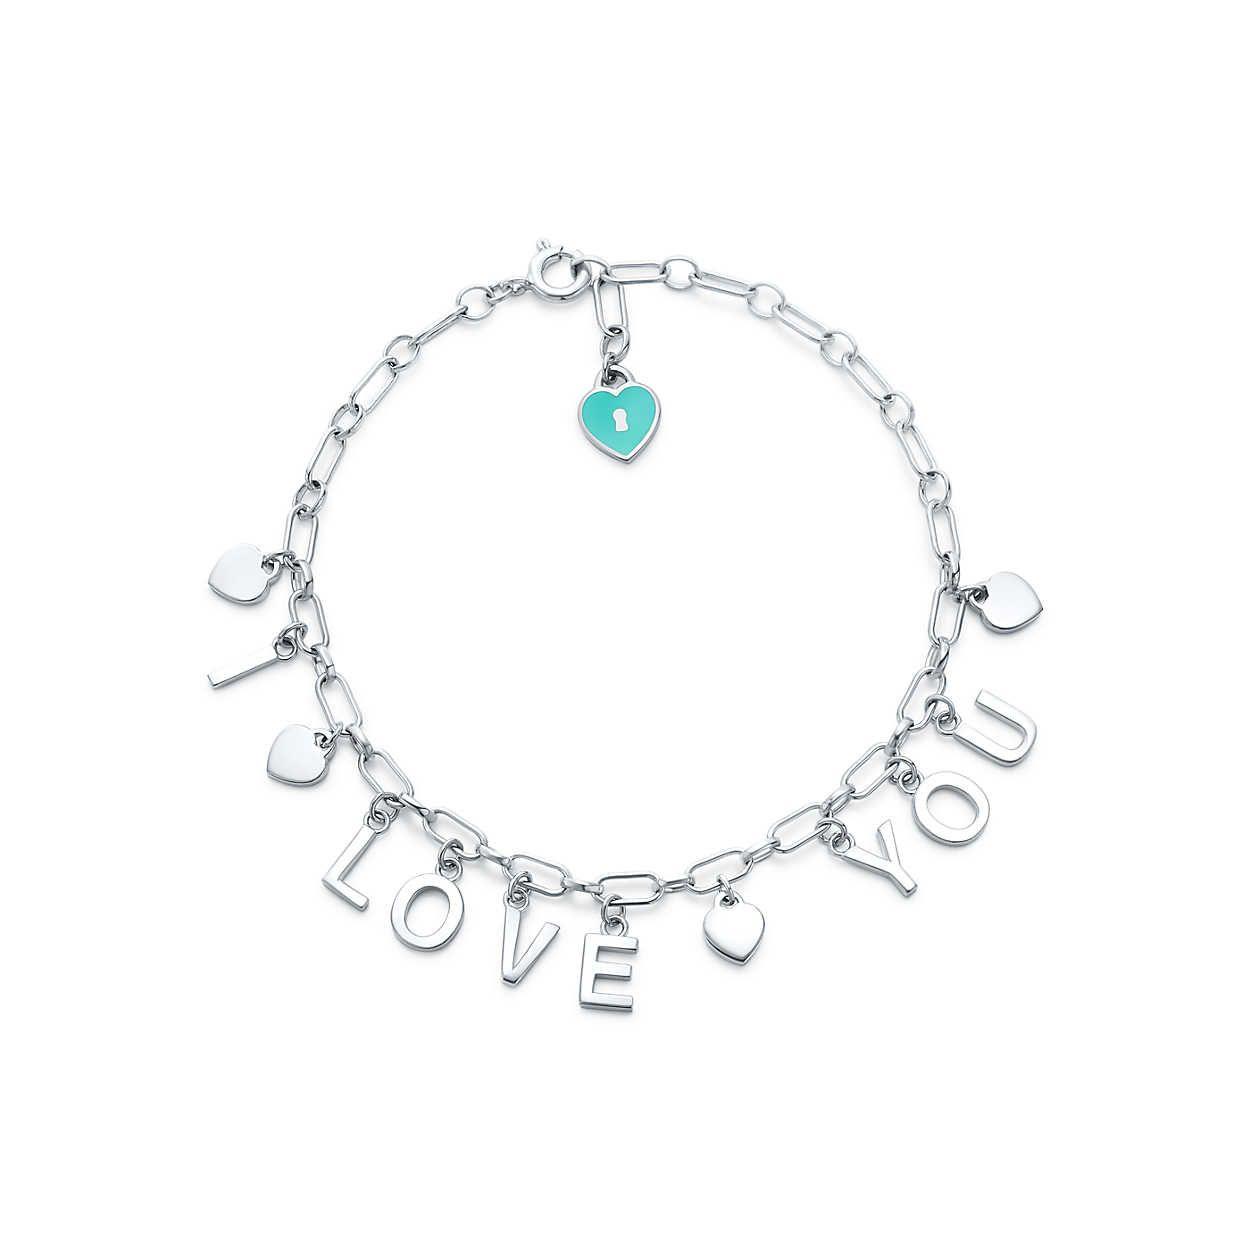 4005c2412 Tiffany Charms:Love Notes DangleCharm Bracelet | My love for Tiffany ...